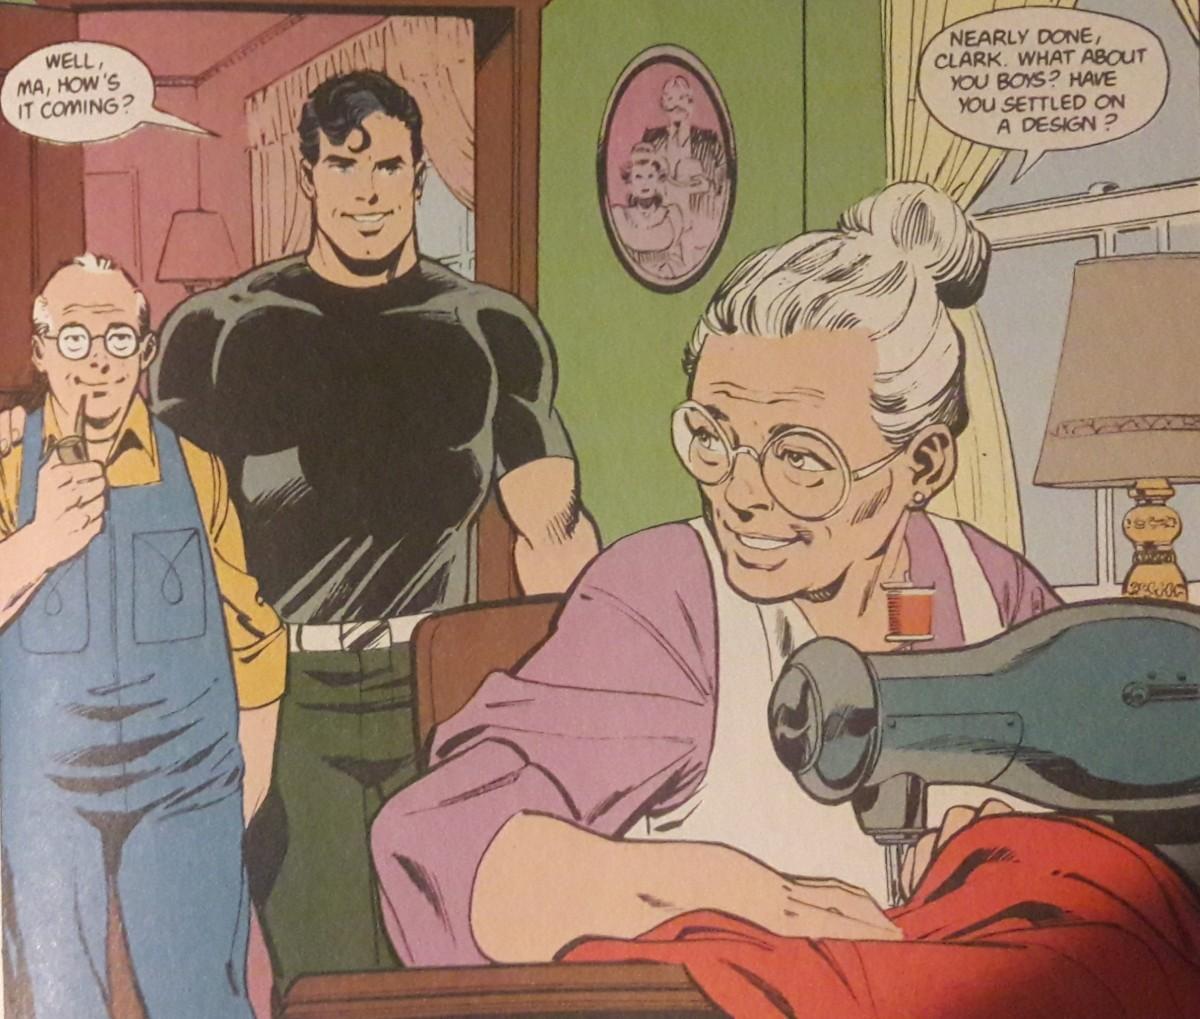 Ma Kent: Super-mom